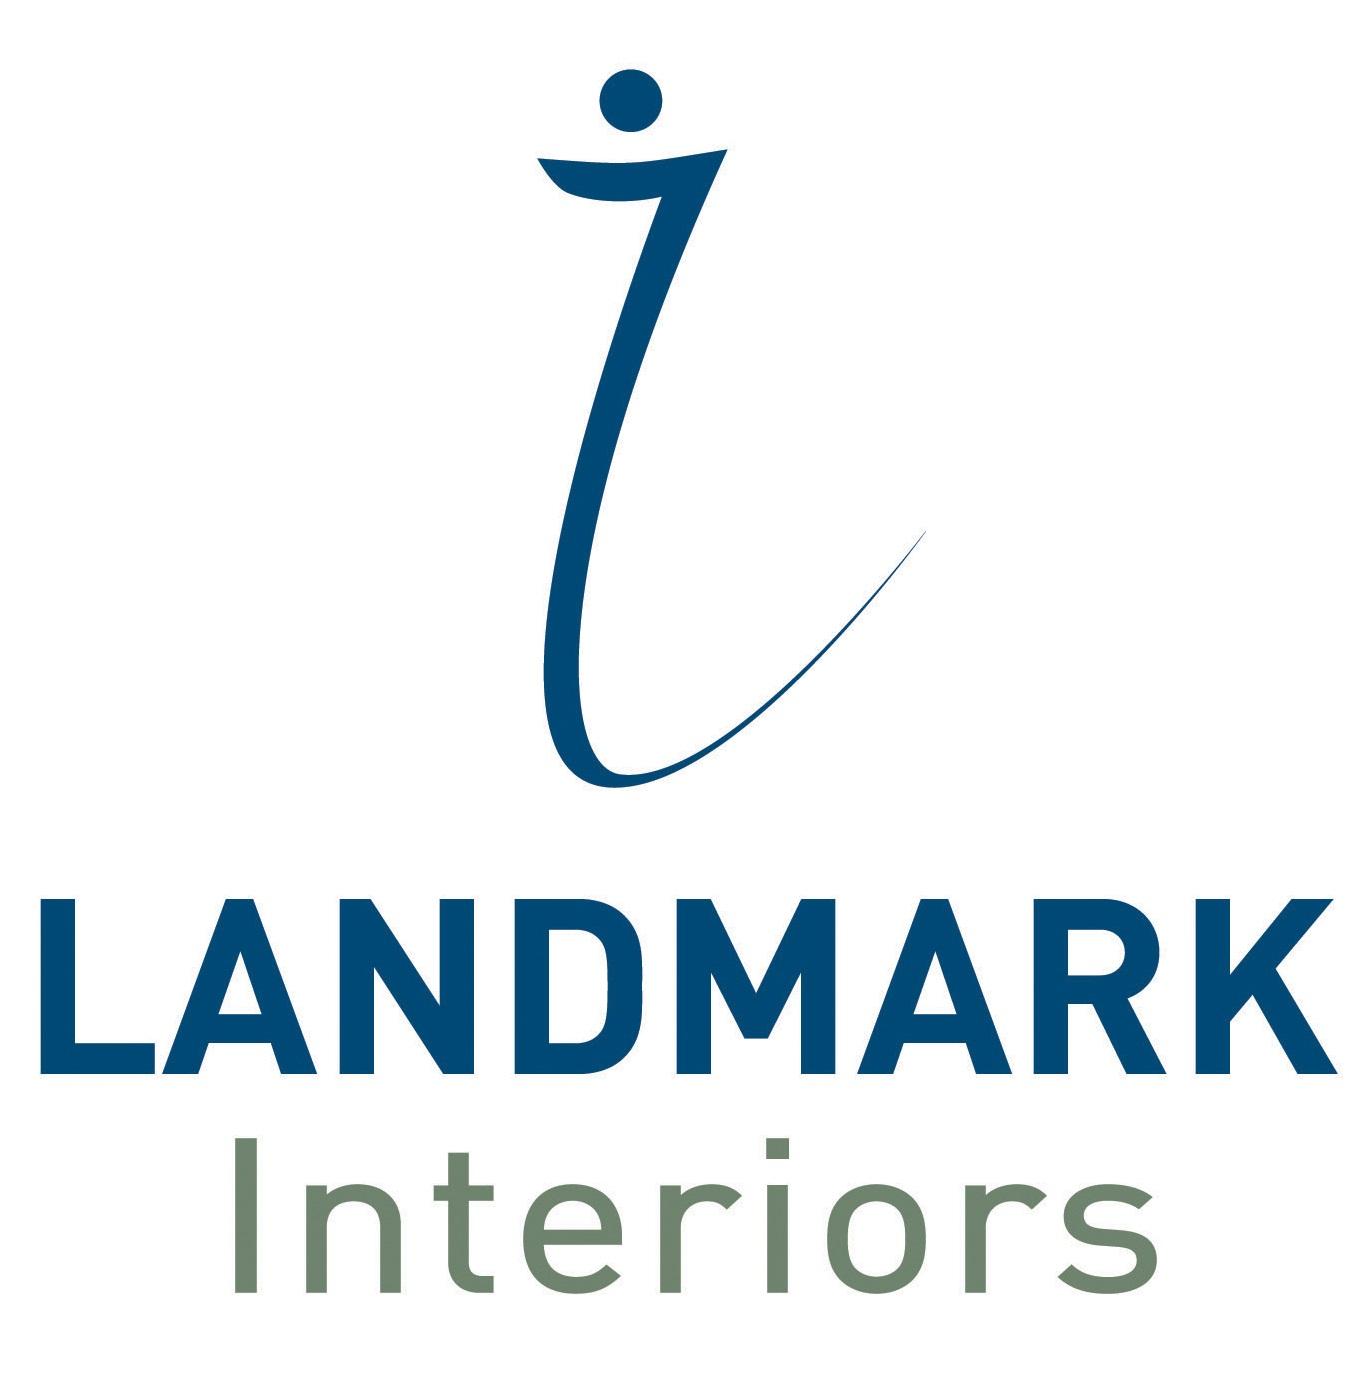 Landmark Interiors